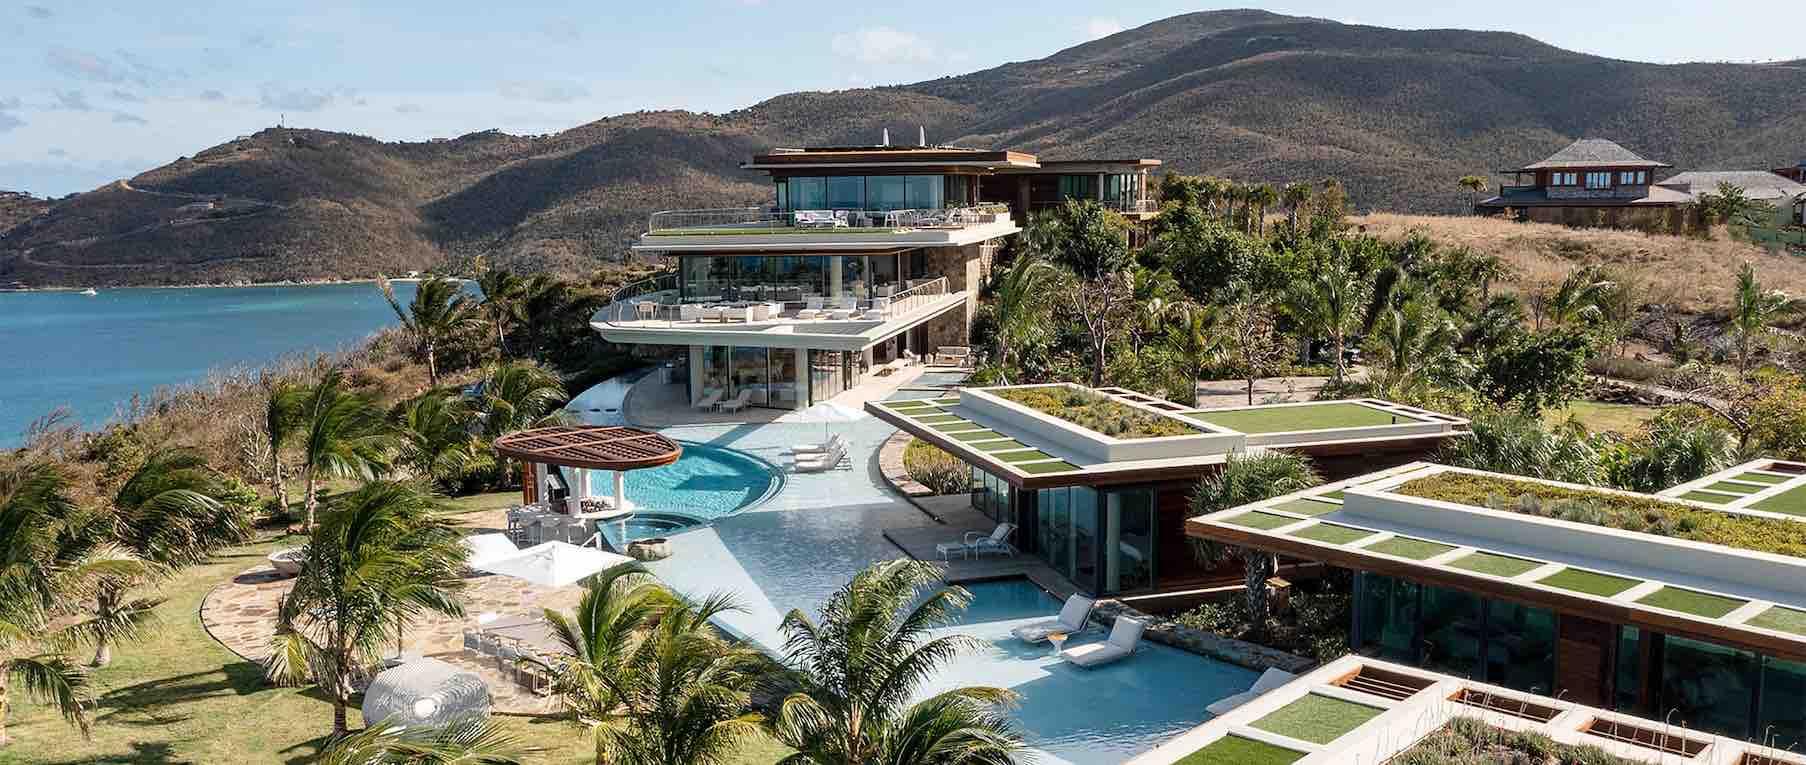 The Oasis Estate